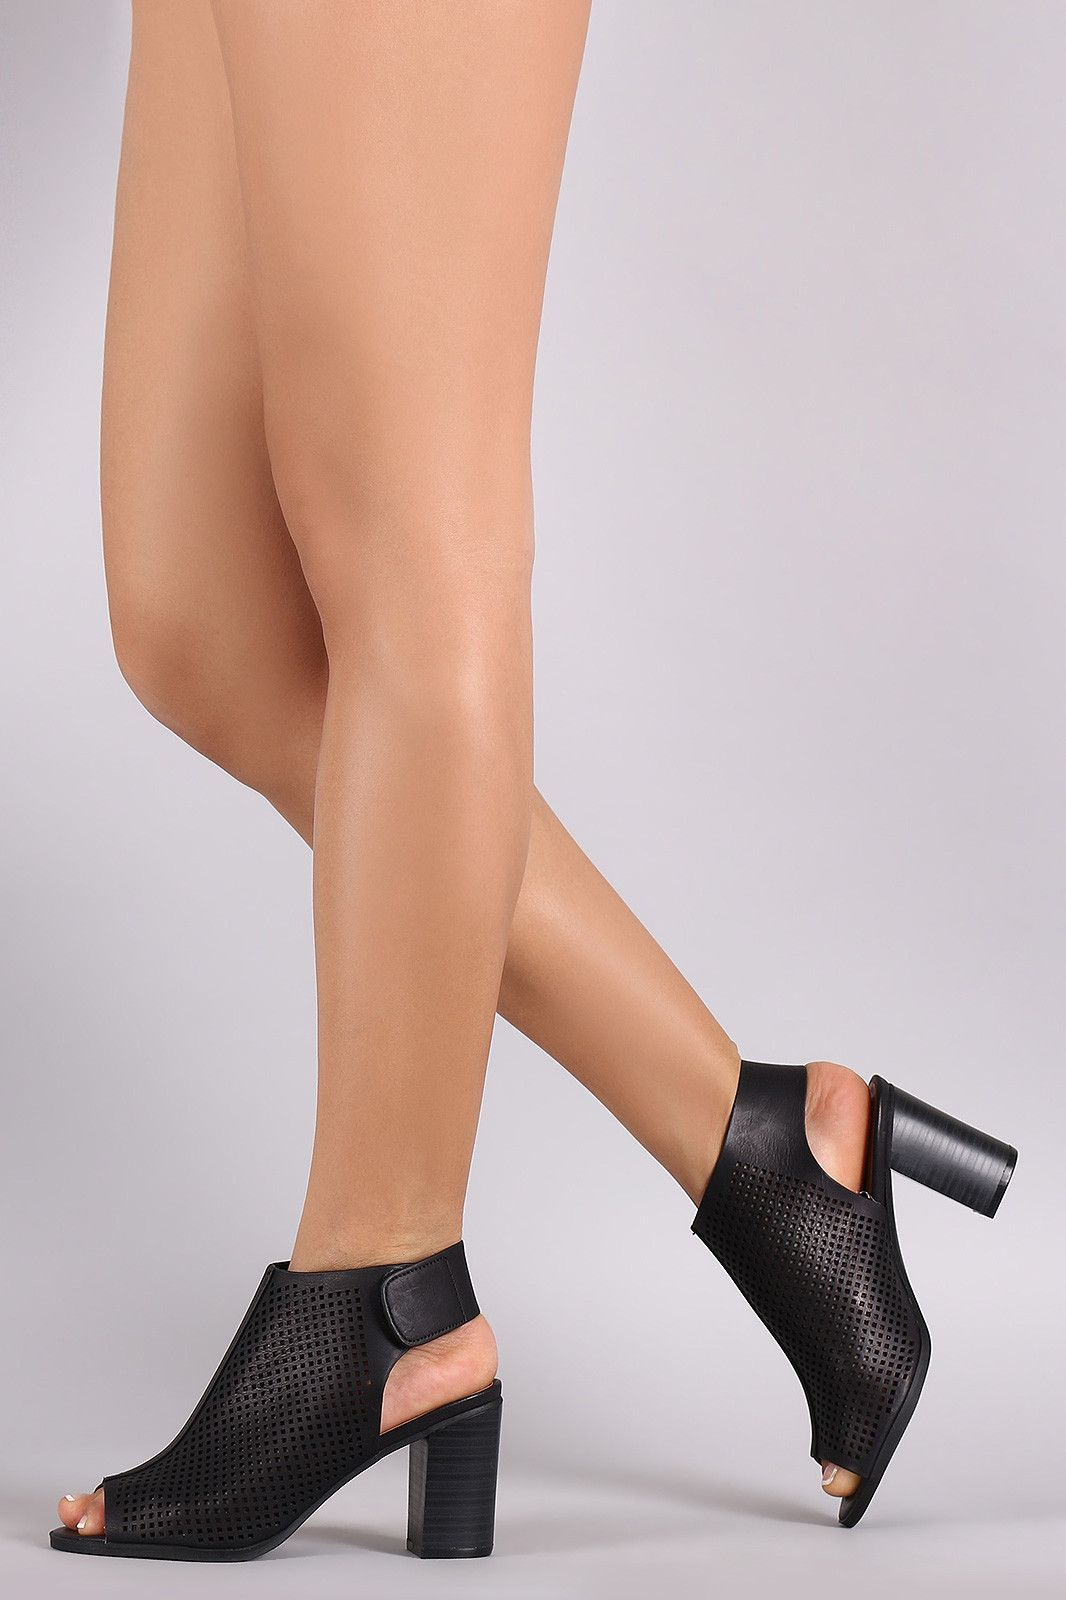 Qupid Womens Shoes Peep Open Toe | Fashion shoes